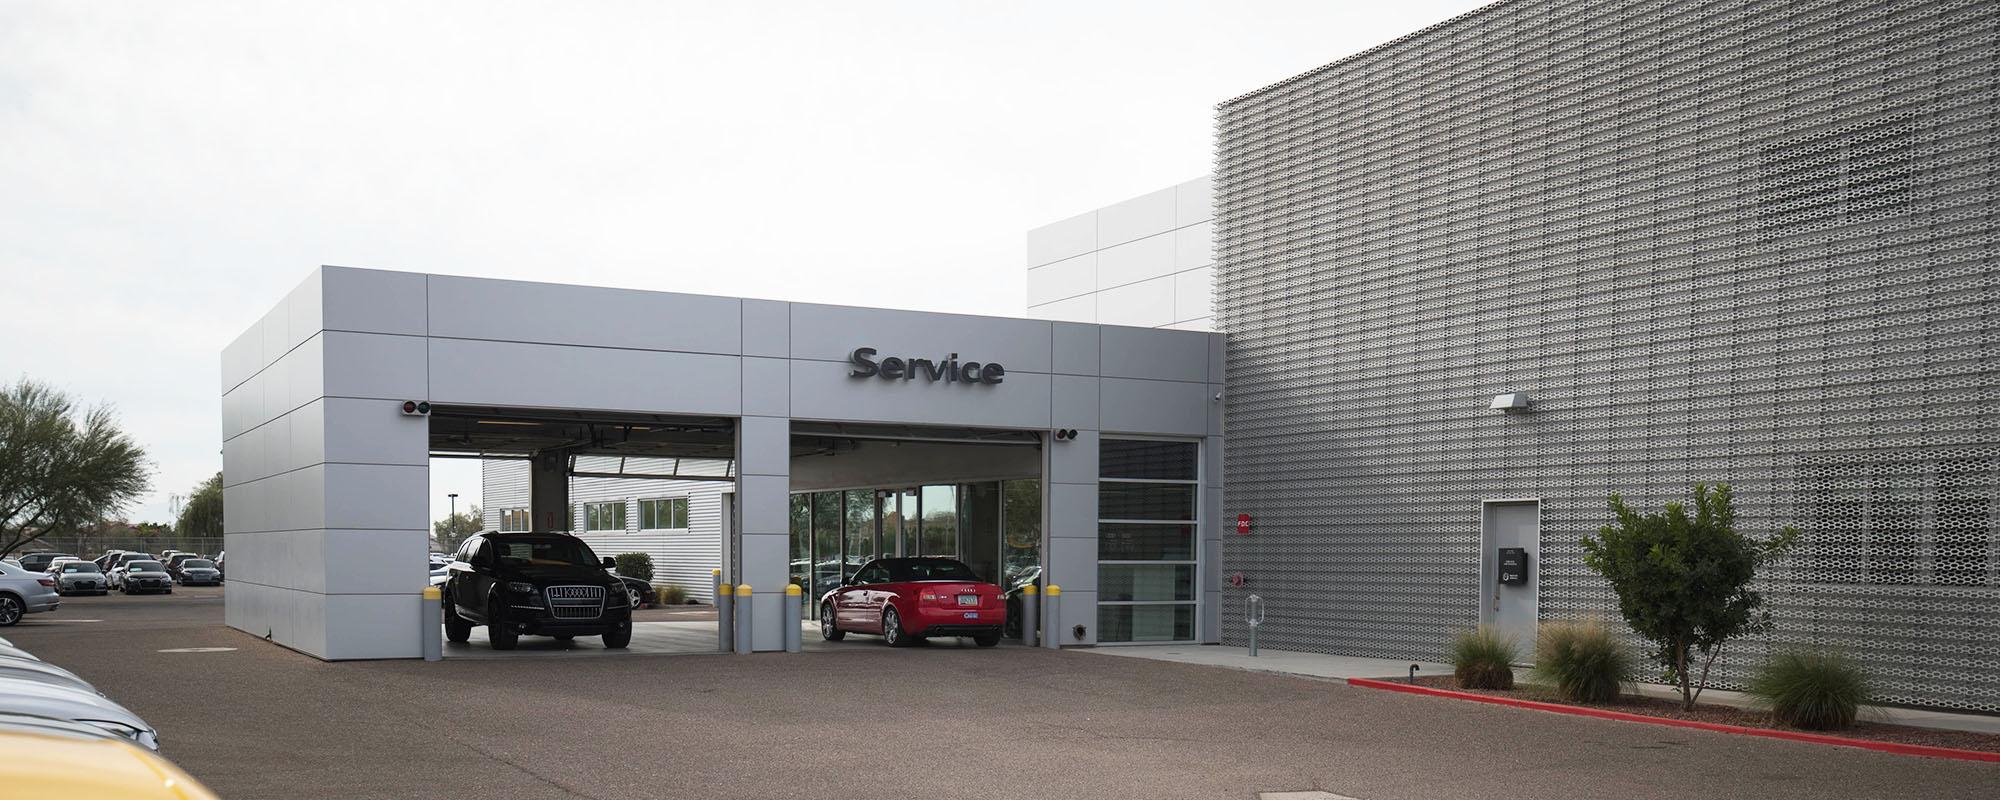 Audi Service Center In Peoria AZ Audi Peoria - Audi peoria